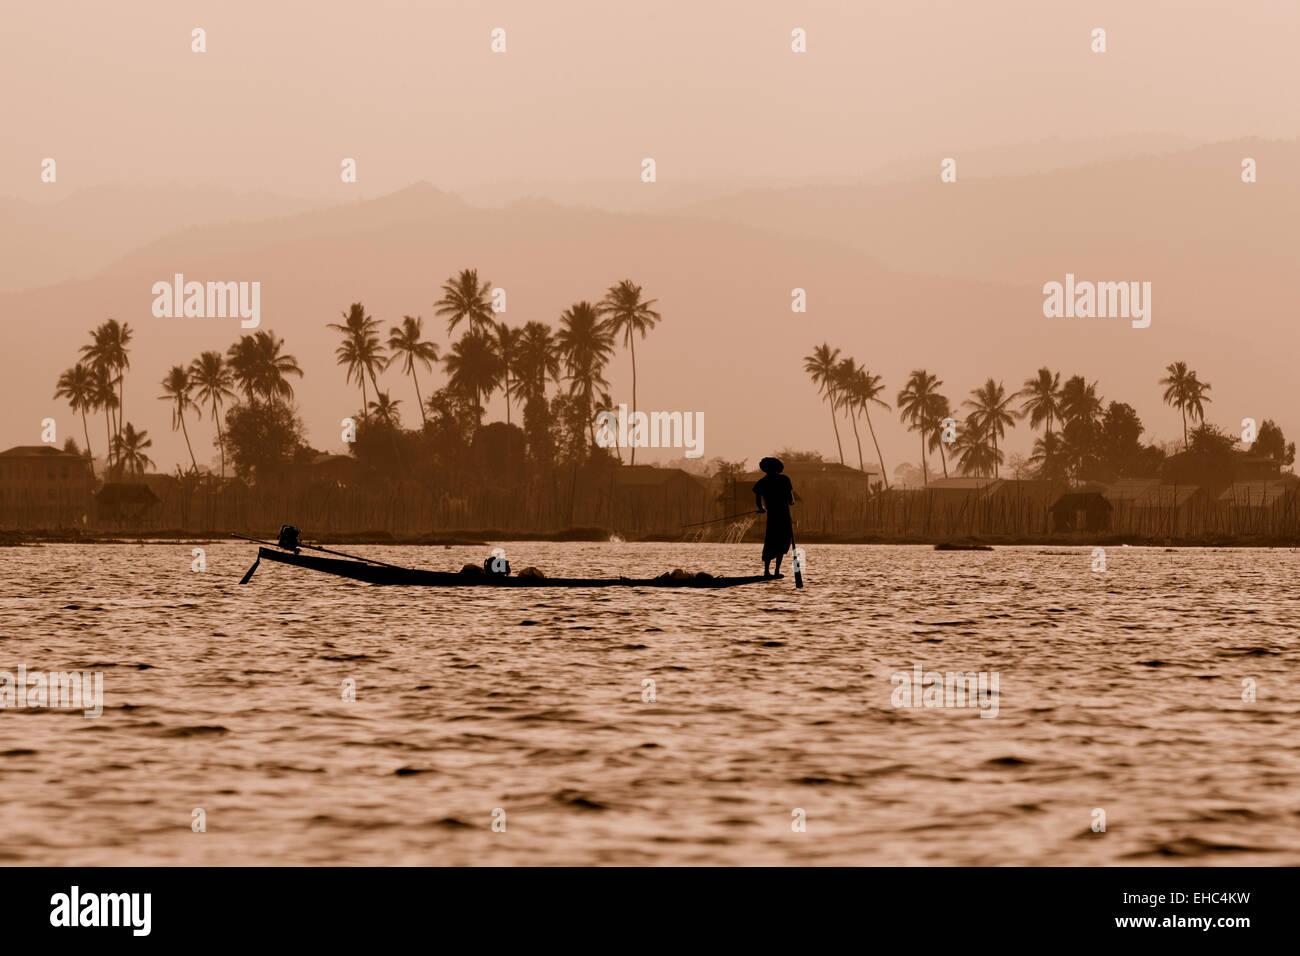 Inle lake landscape at dusk with fisherman, Inle Lake, Myanmar ( Burma ), Asia Stock Photo